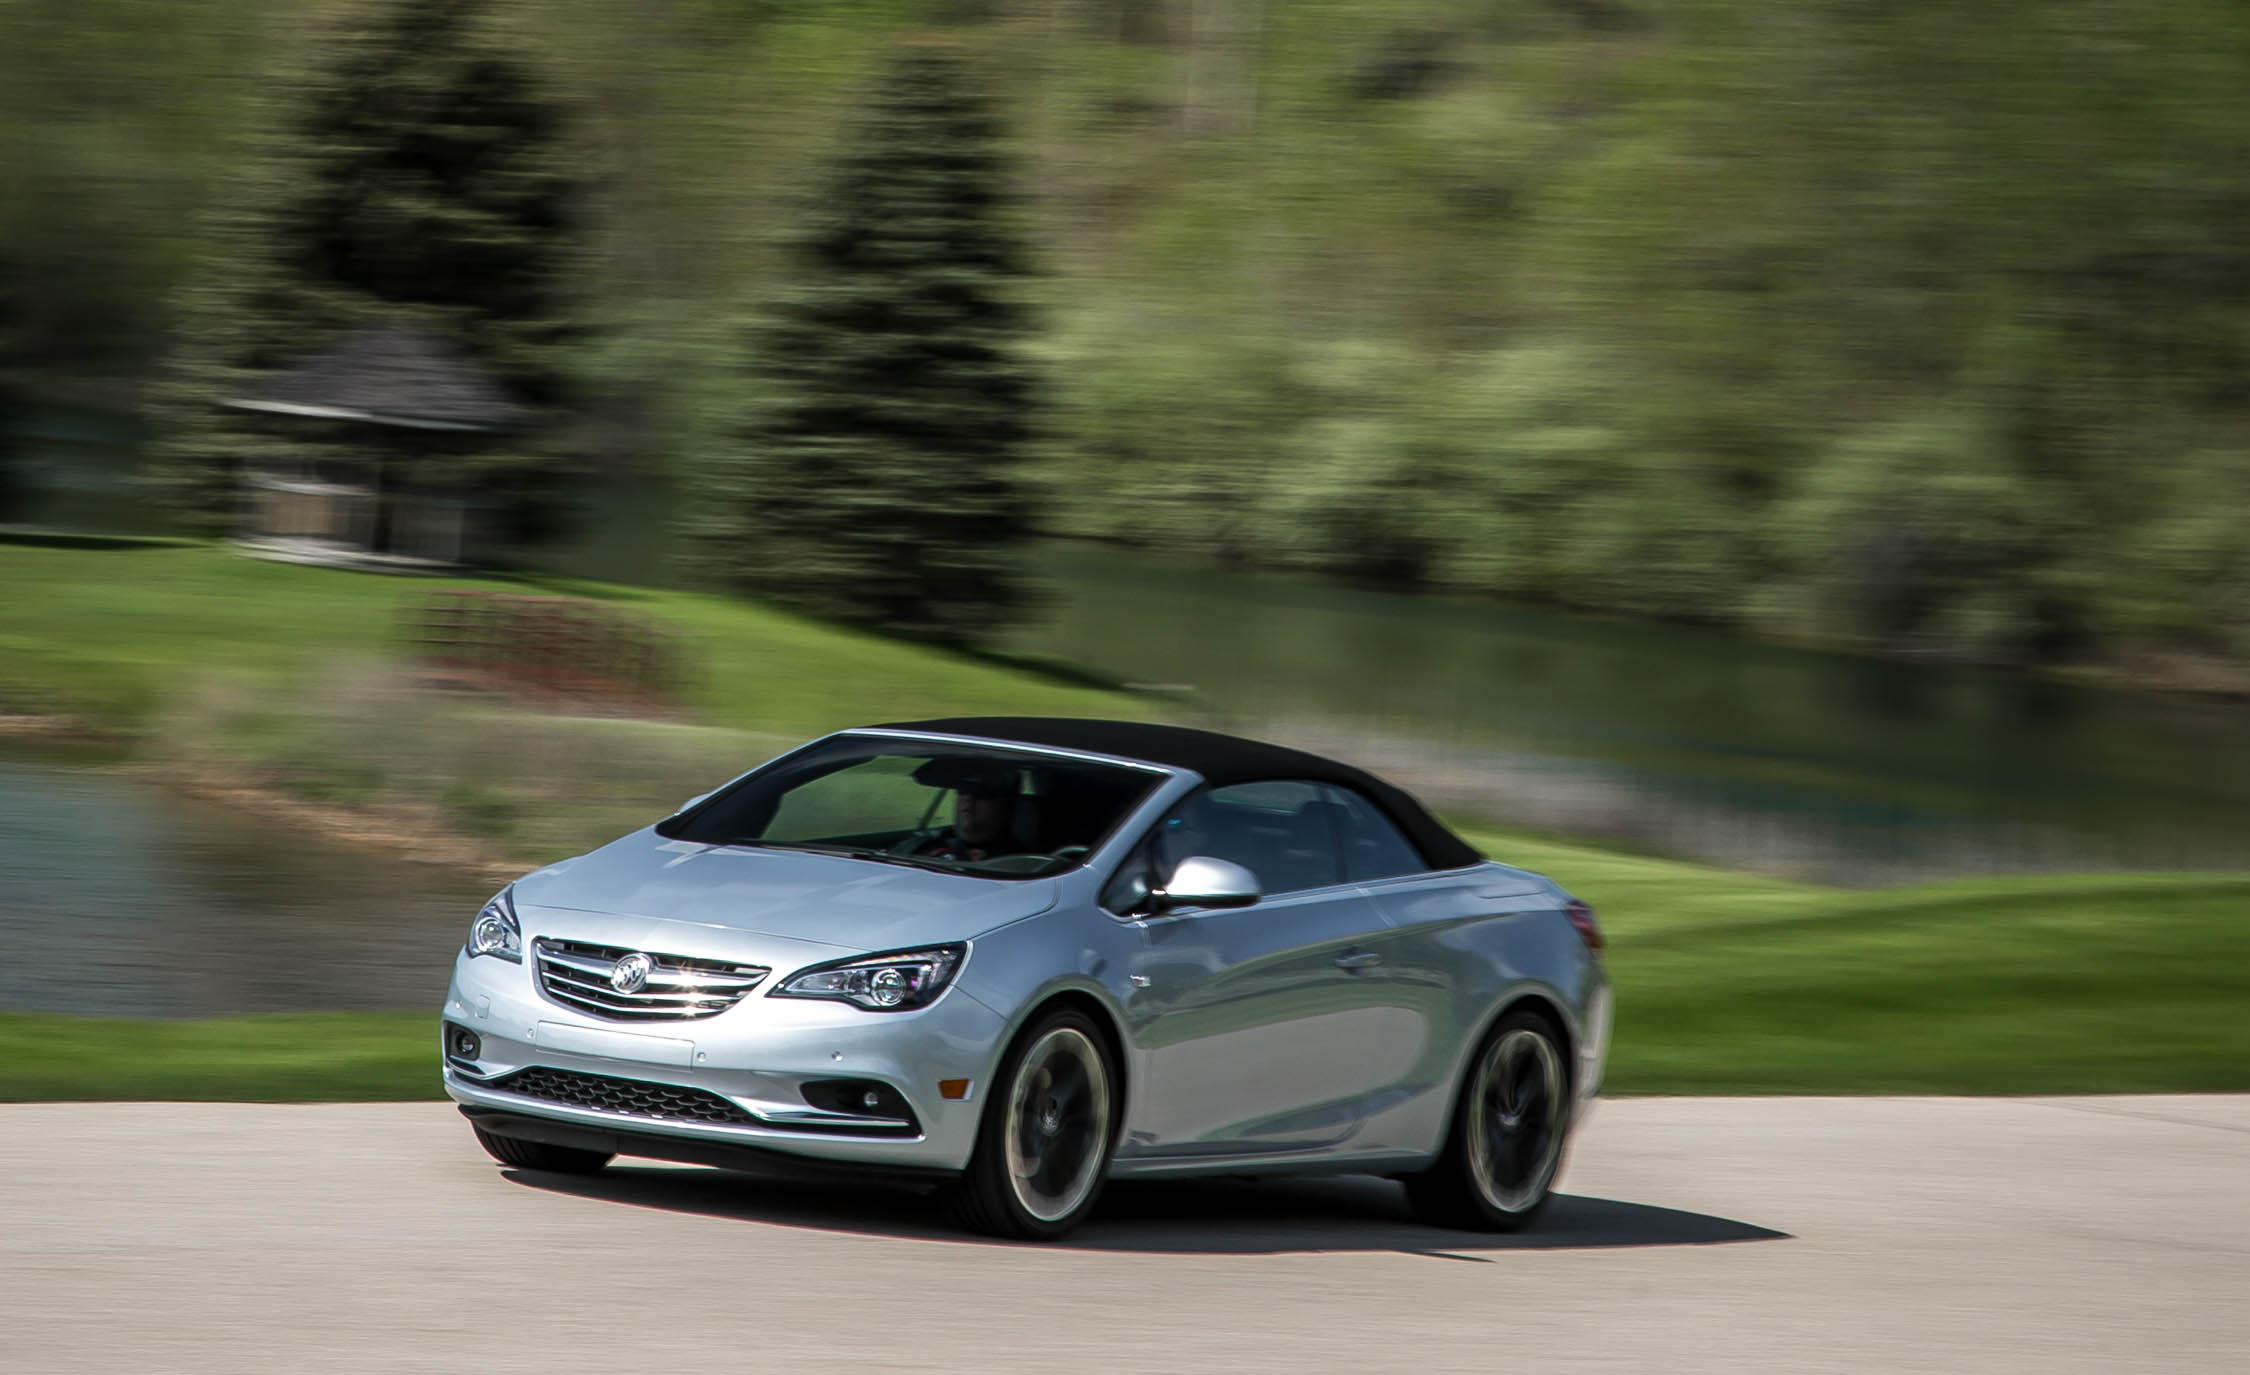 2016 Buick Cascada Premium (View 15 of 24)